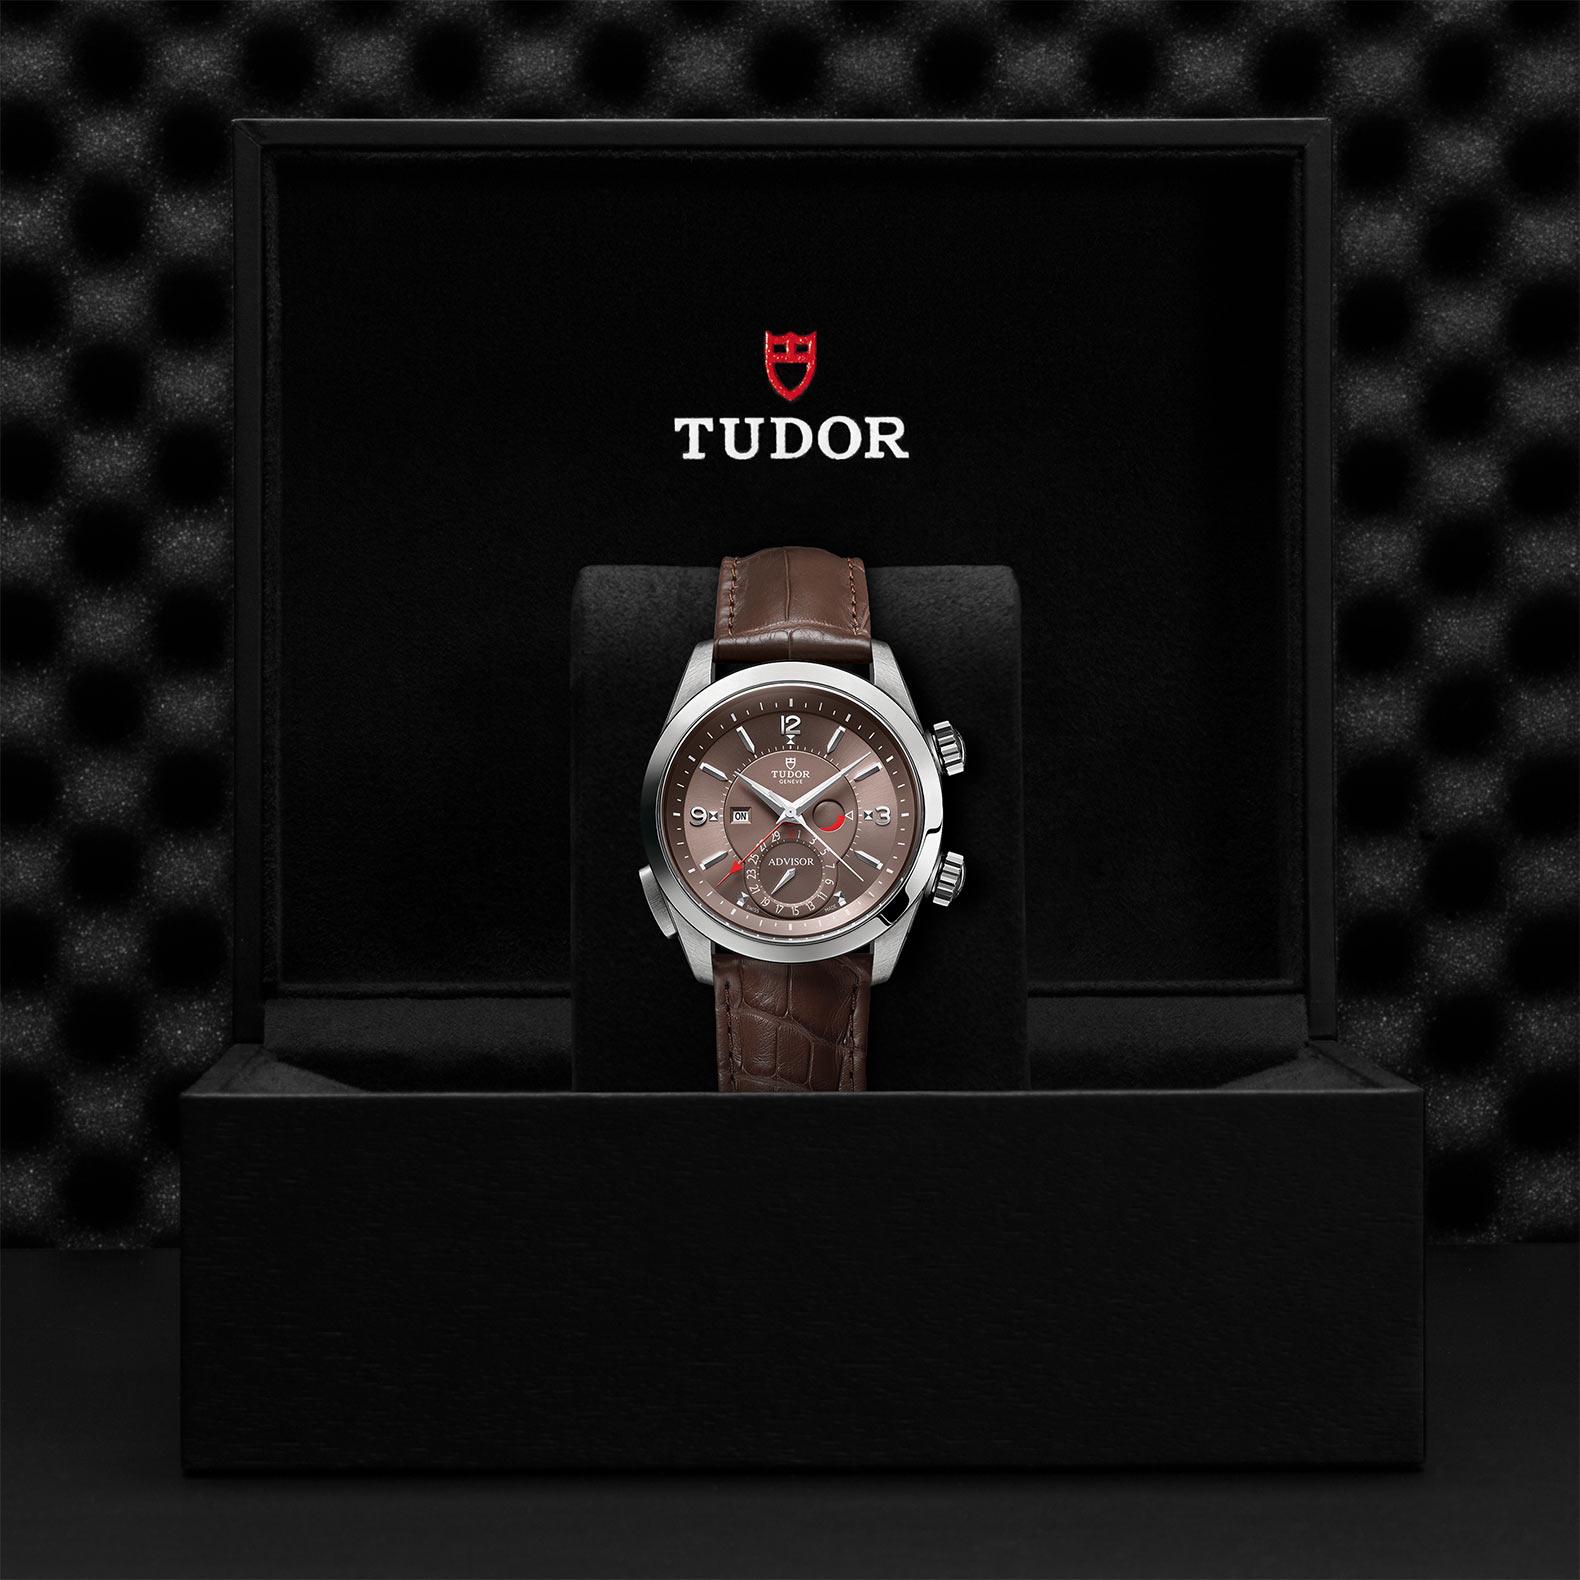 TUDOR Heritage Advisor - M79620TC-0006